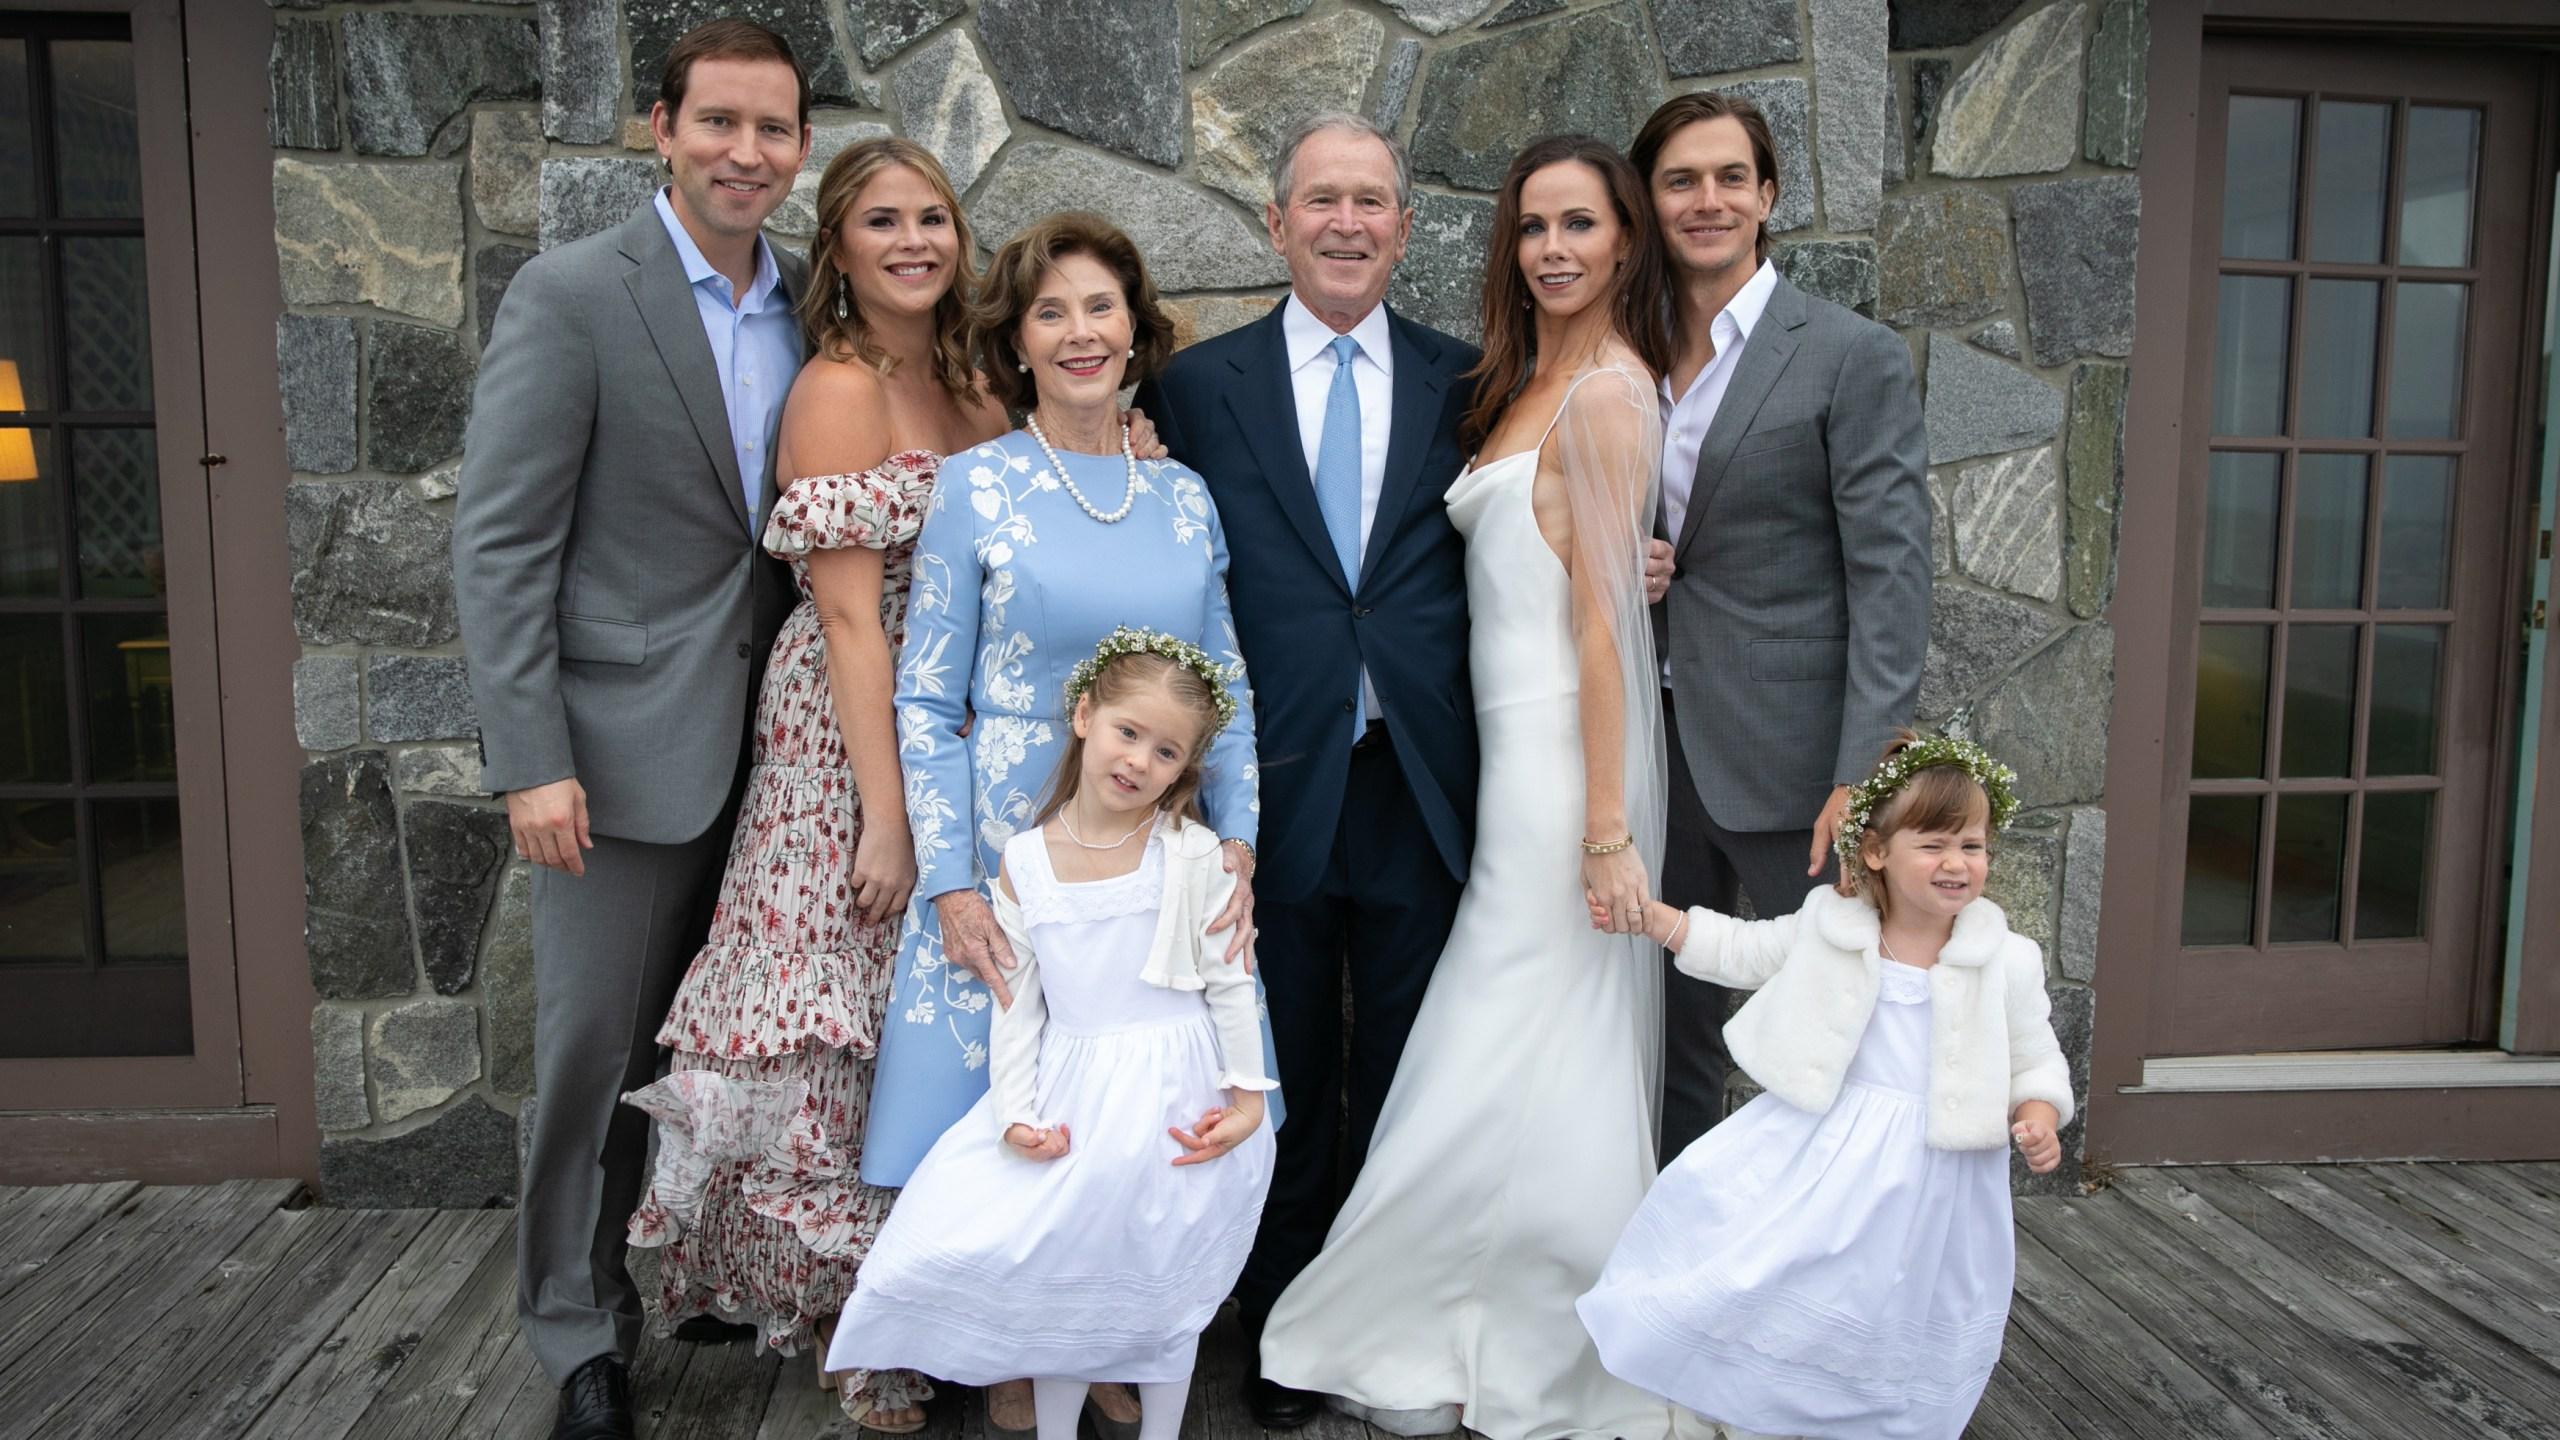 marriage president gay Bush